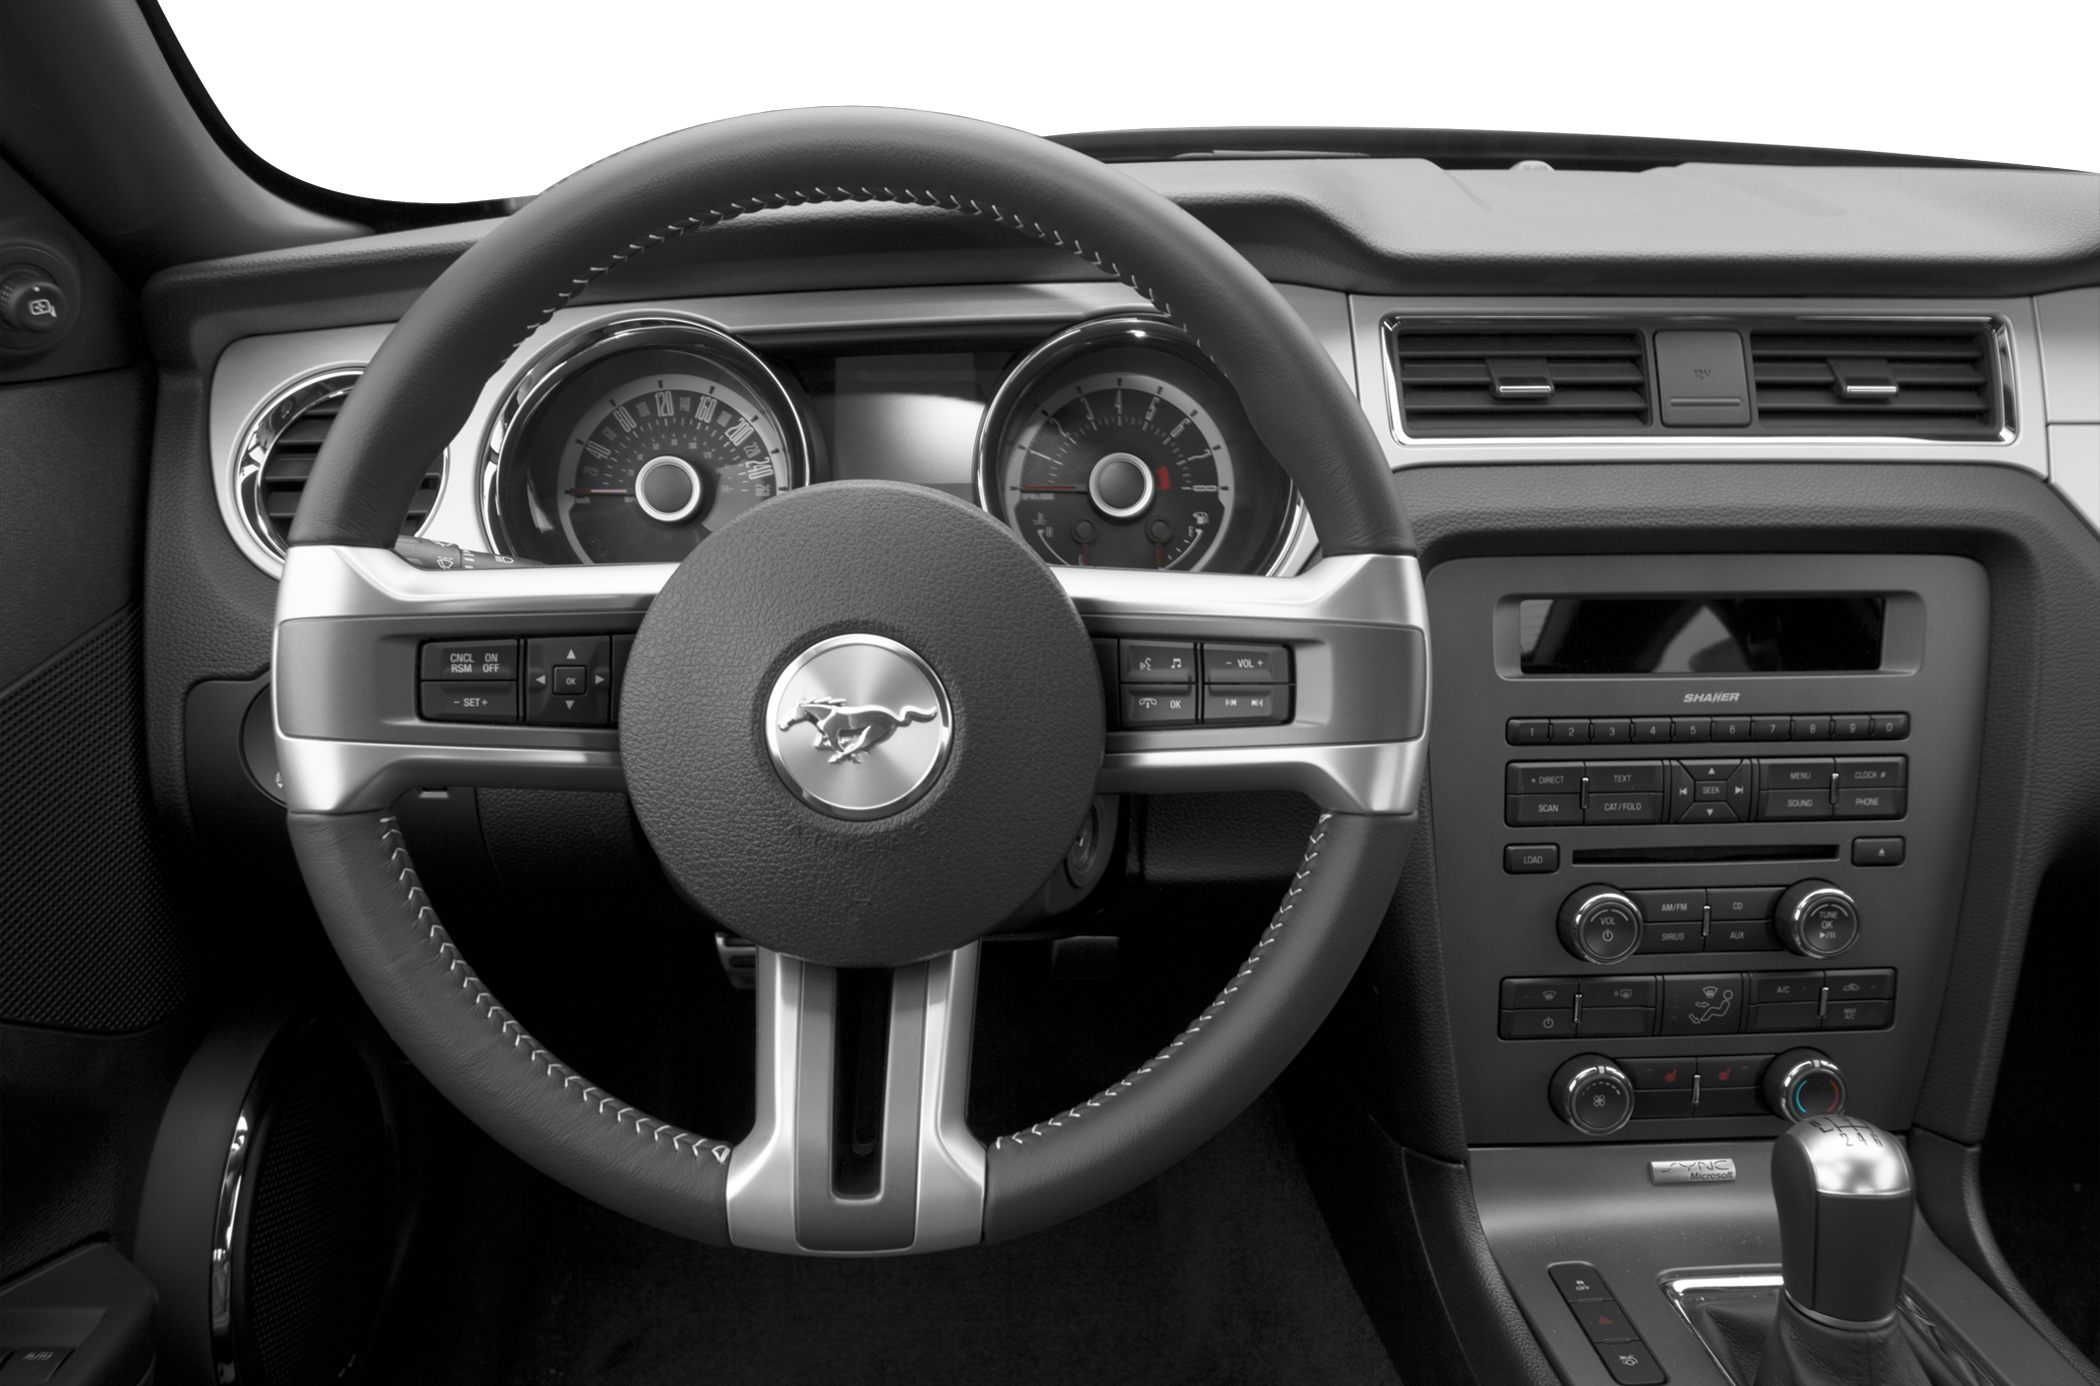 2017 ford mustang sports car models amp specs fordcom